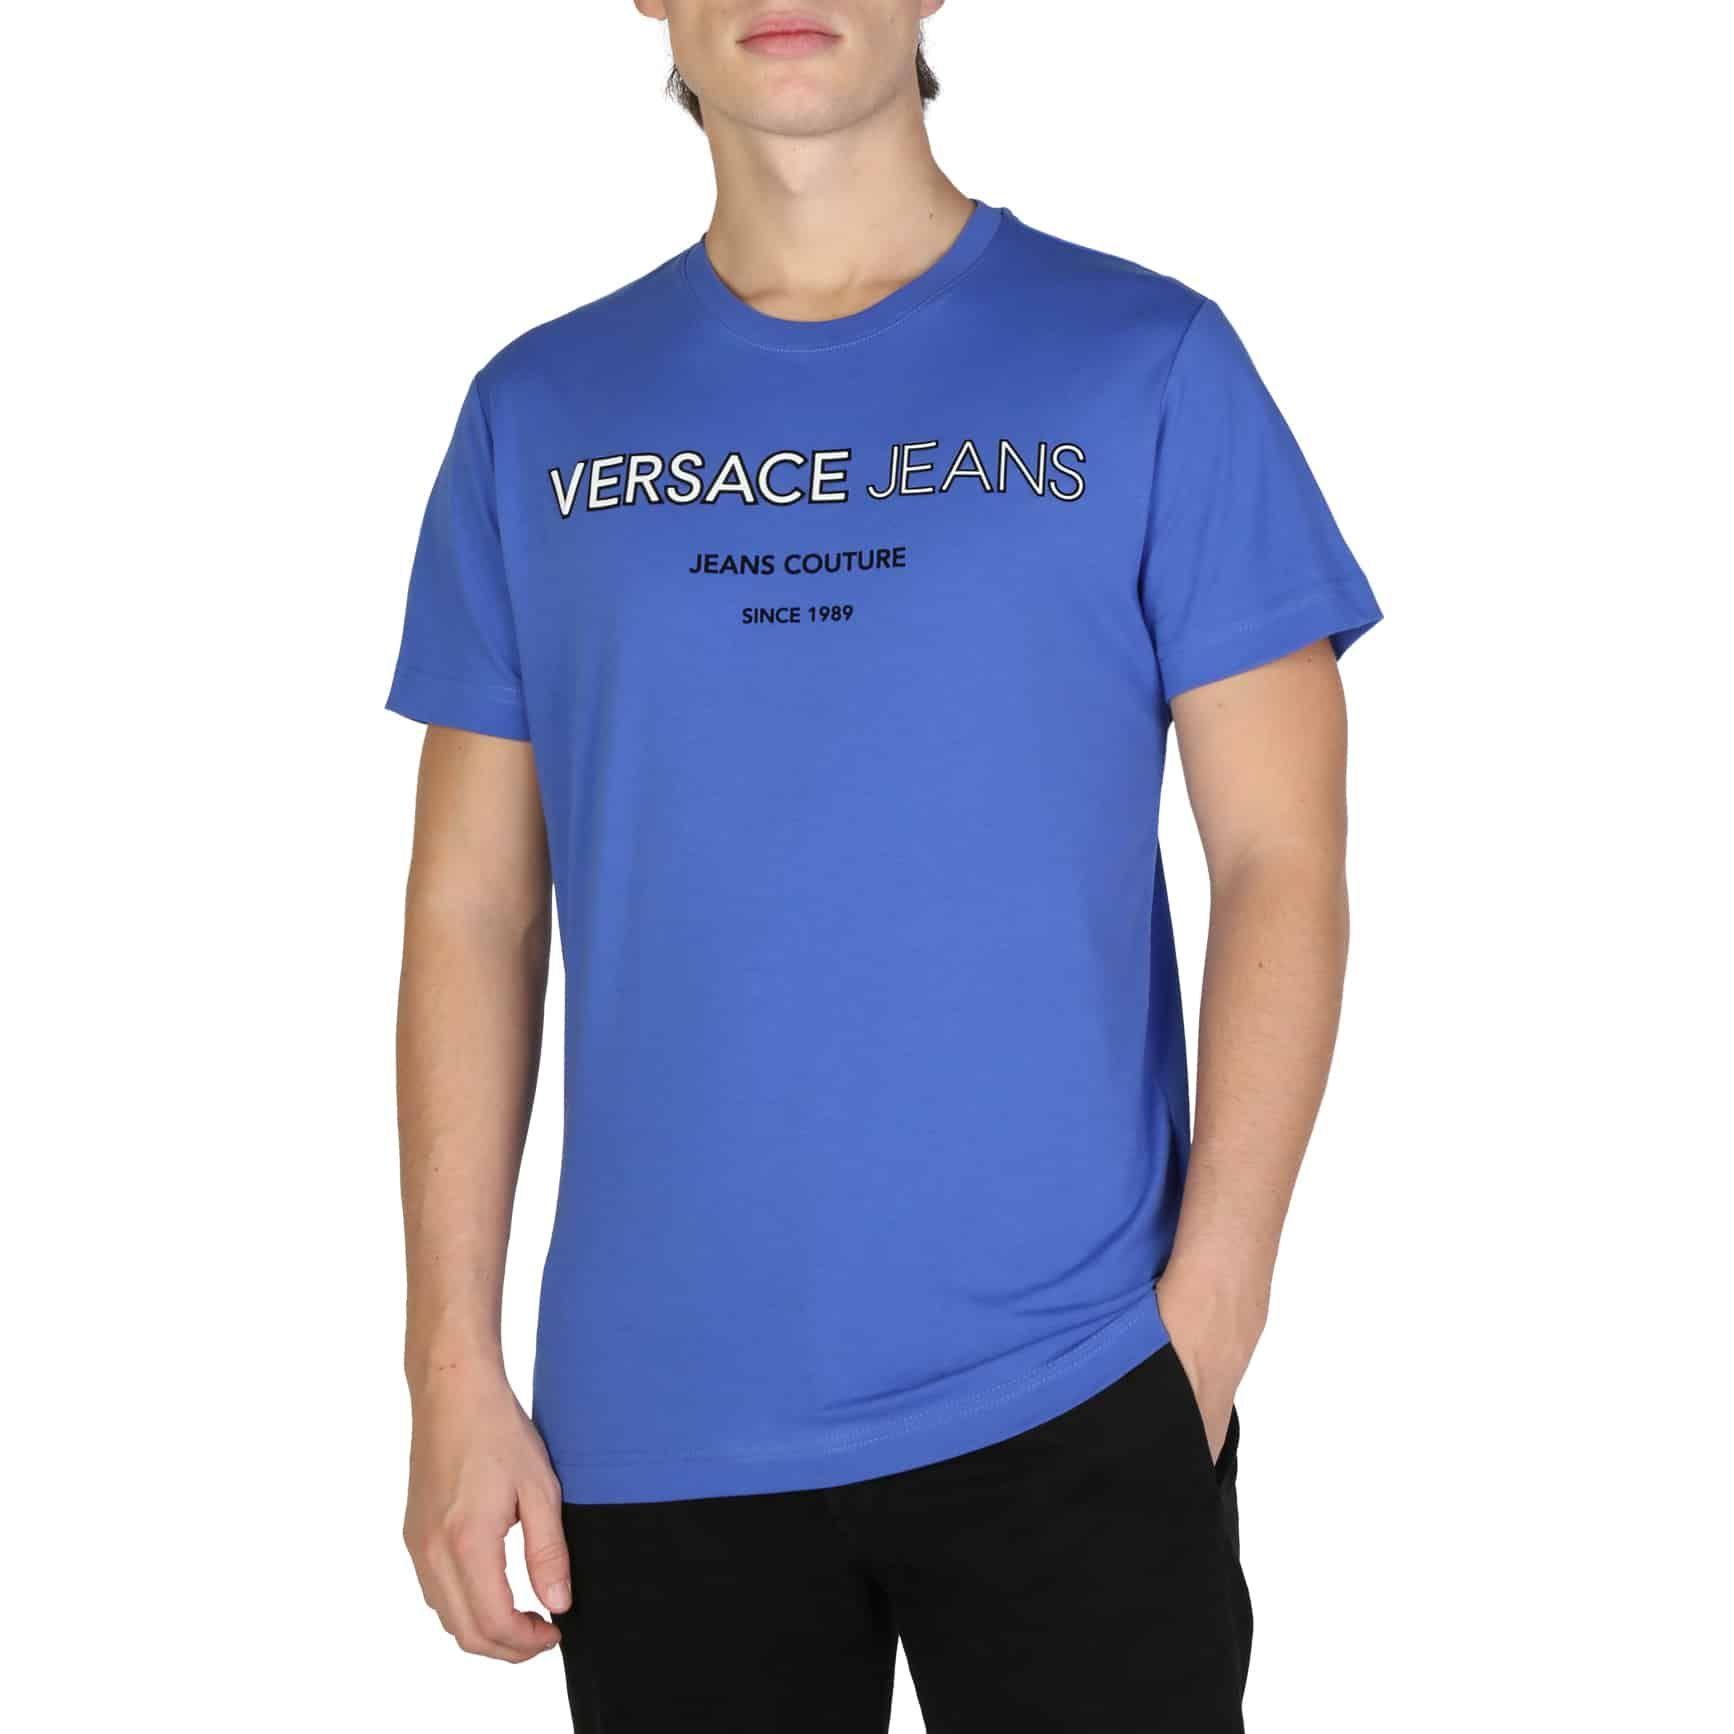 Versace Jeans – B3GSB71C_36609